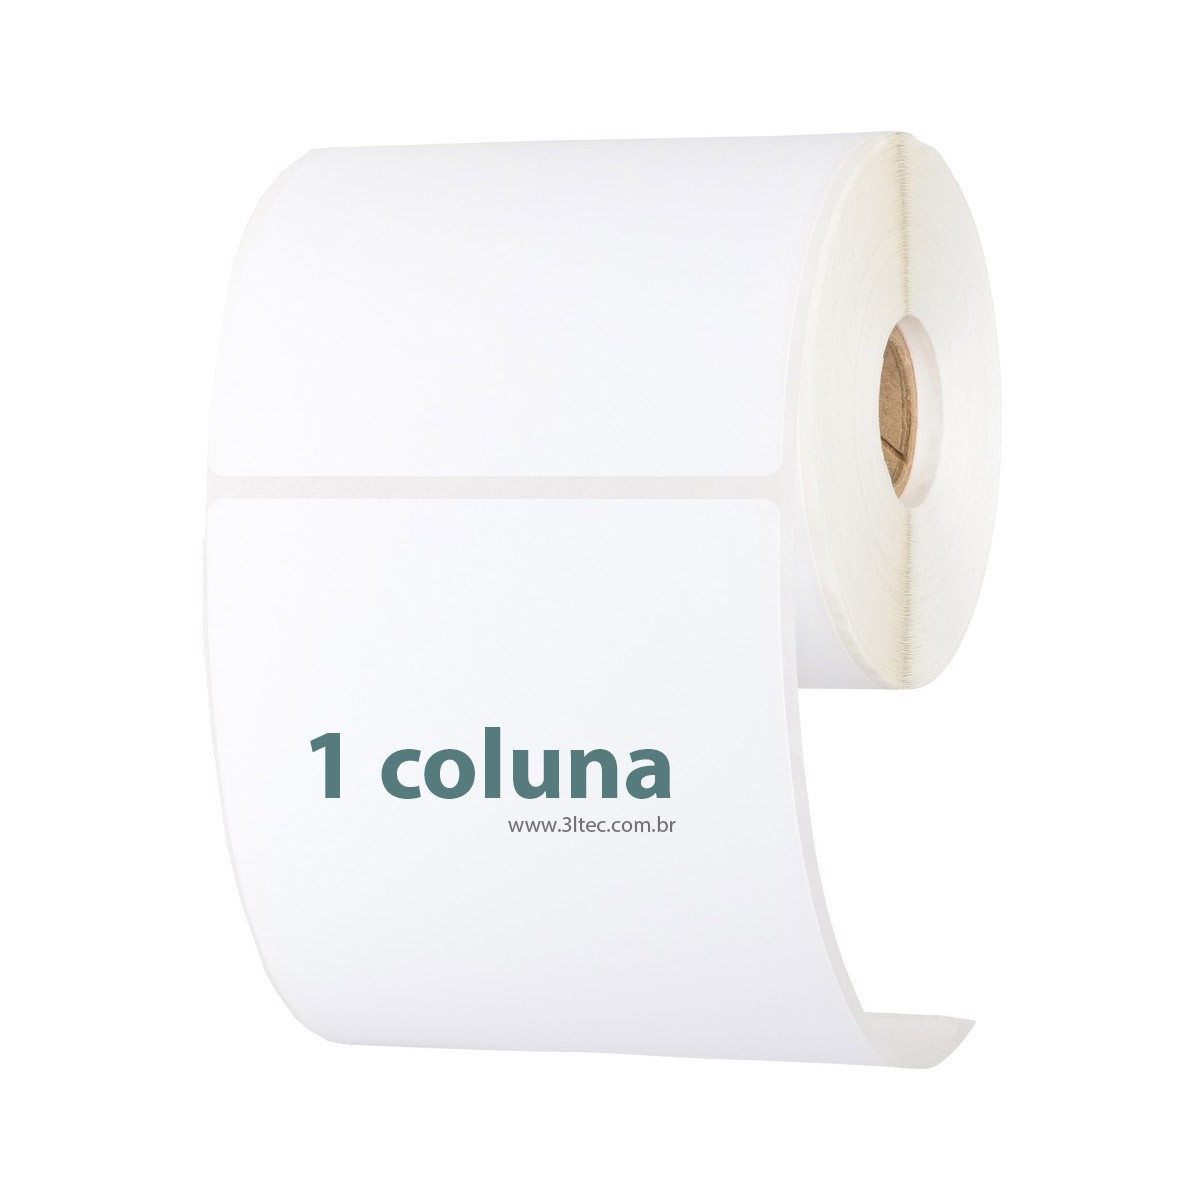 Etiquetas Adesivas - Rolo de 40 metros - 1 coluna, Faturamento minimo de 5 rolos